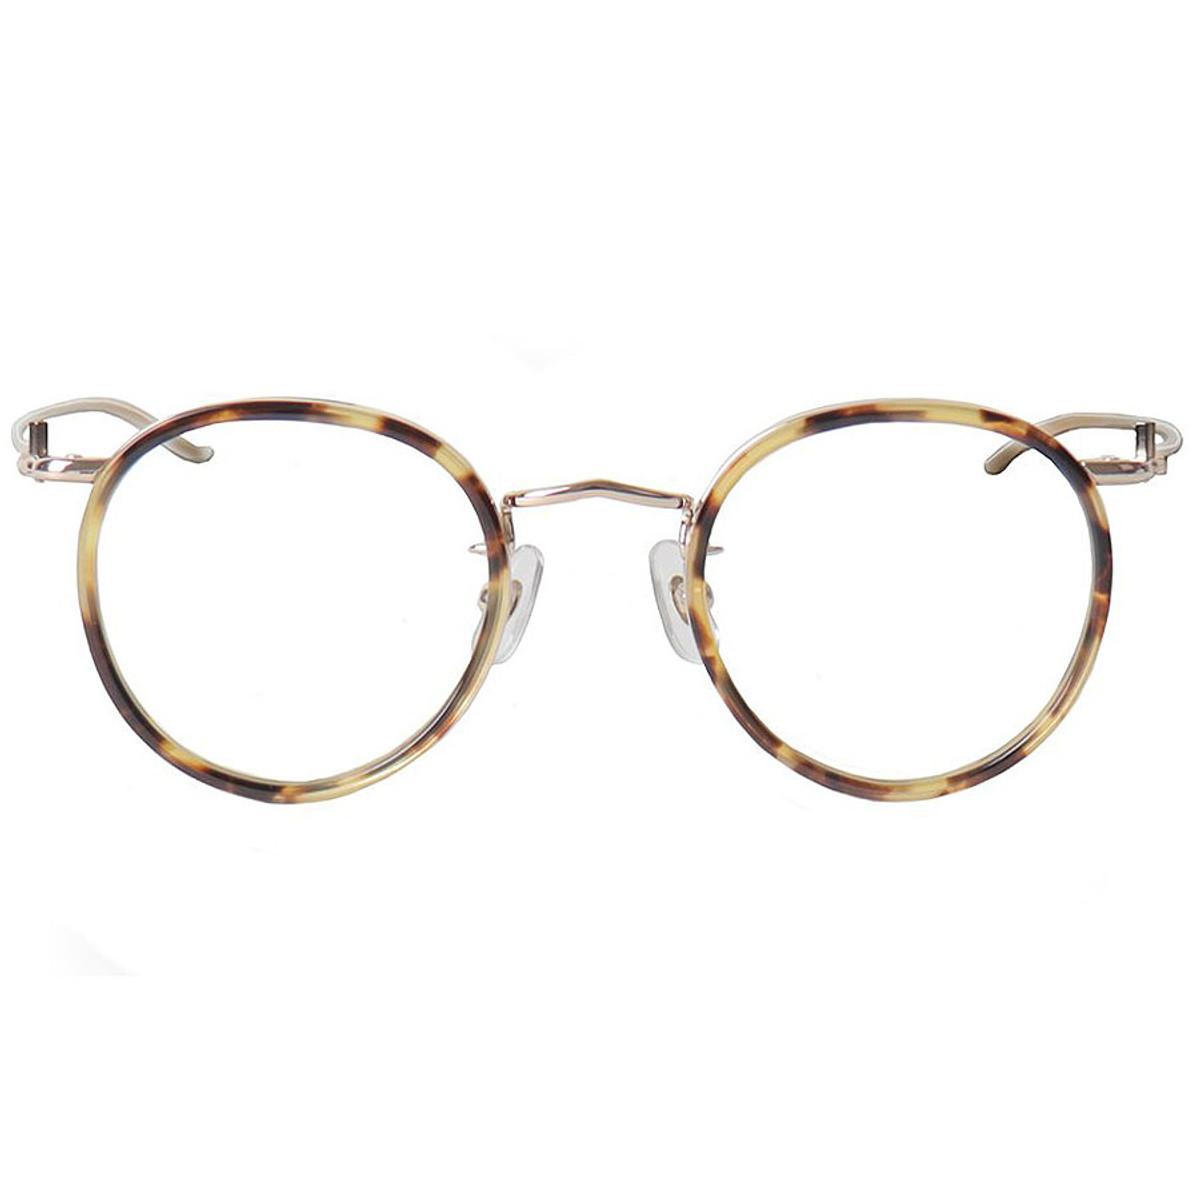 414227648d046 LIYUE Nerd Round Glasses men Vintage Round metal optical Frame for girl  Gold Eyewear Frame Glasses